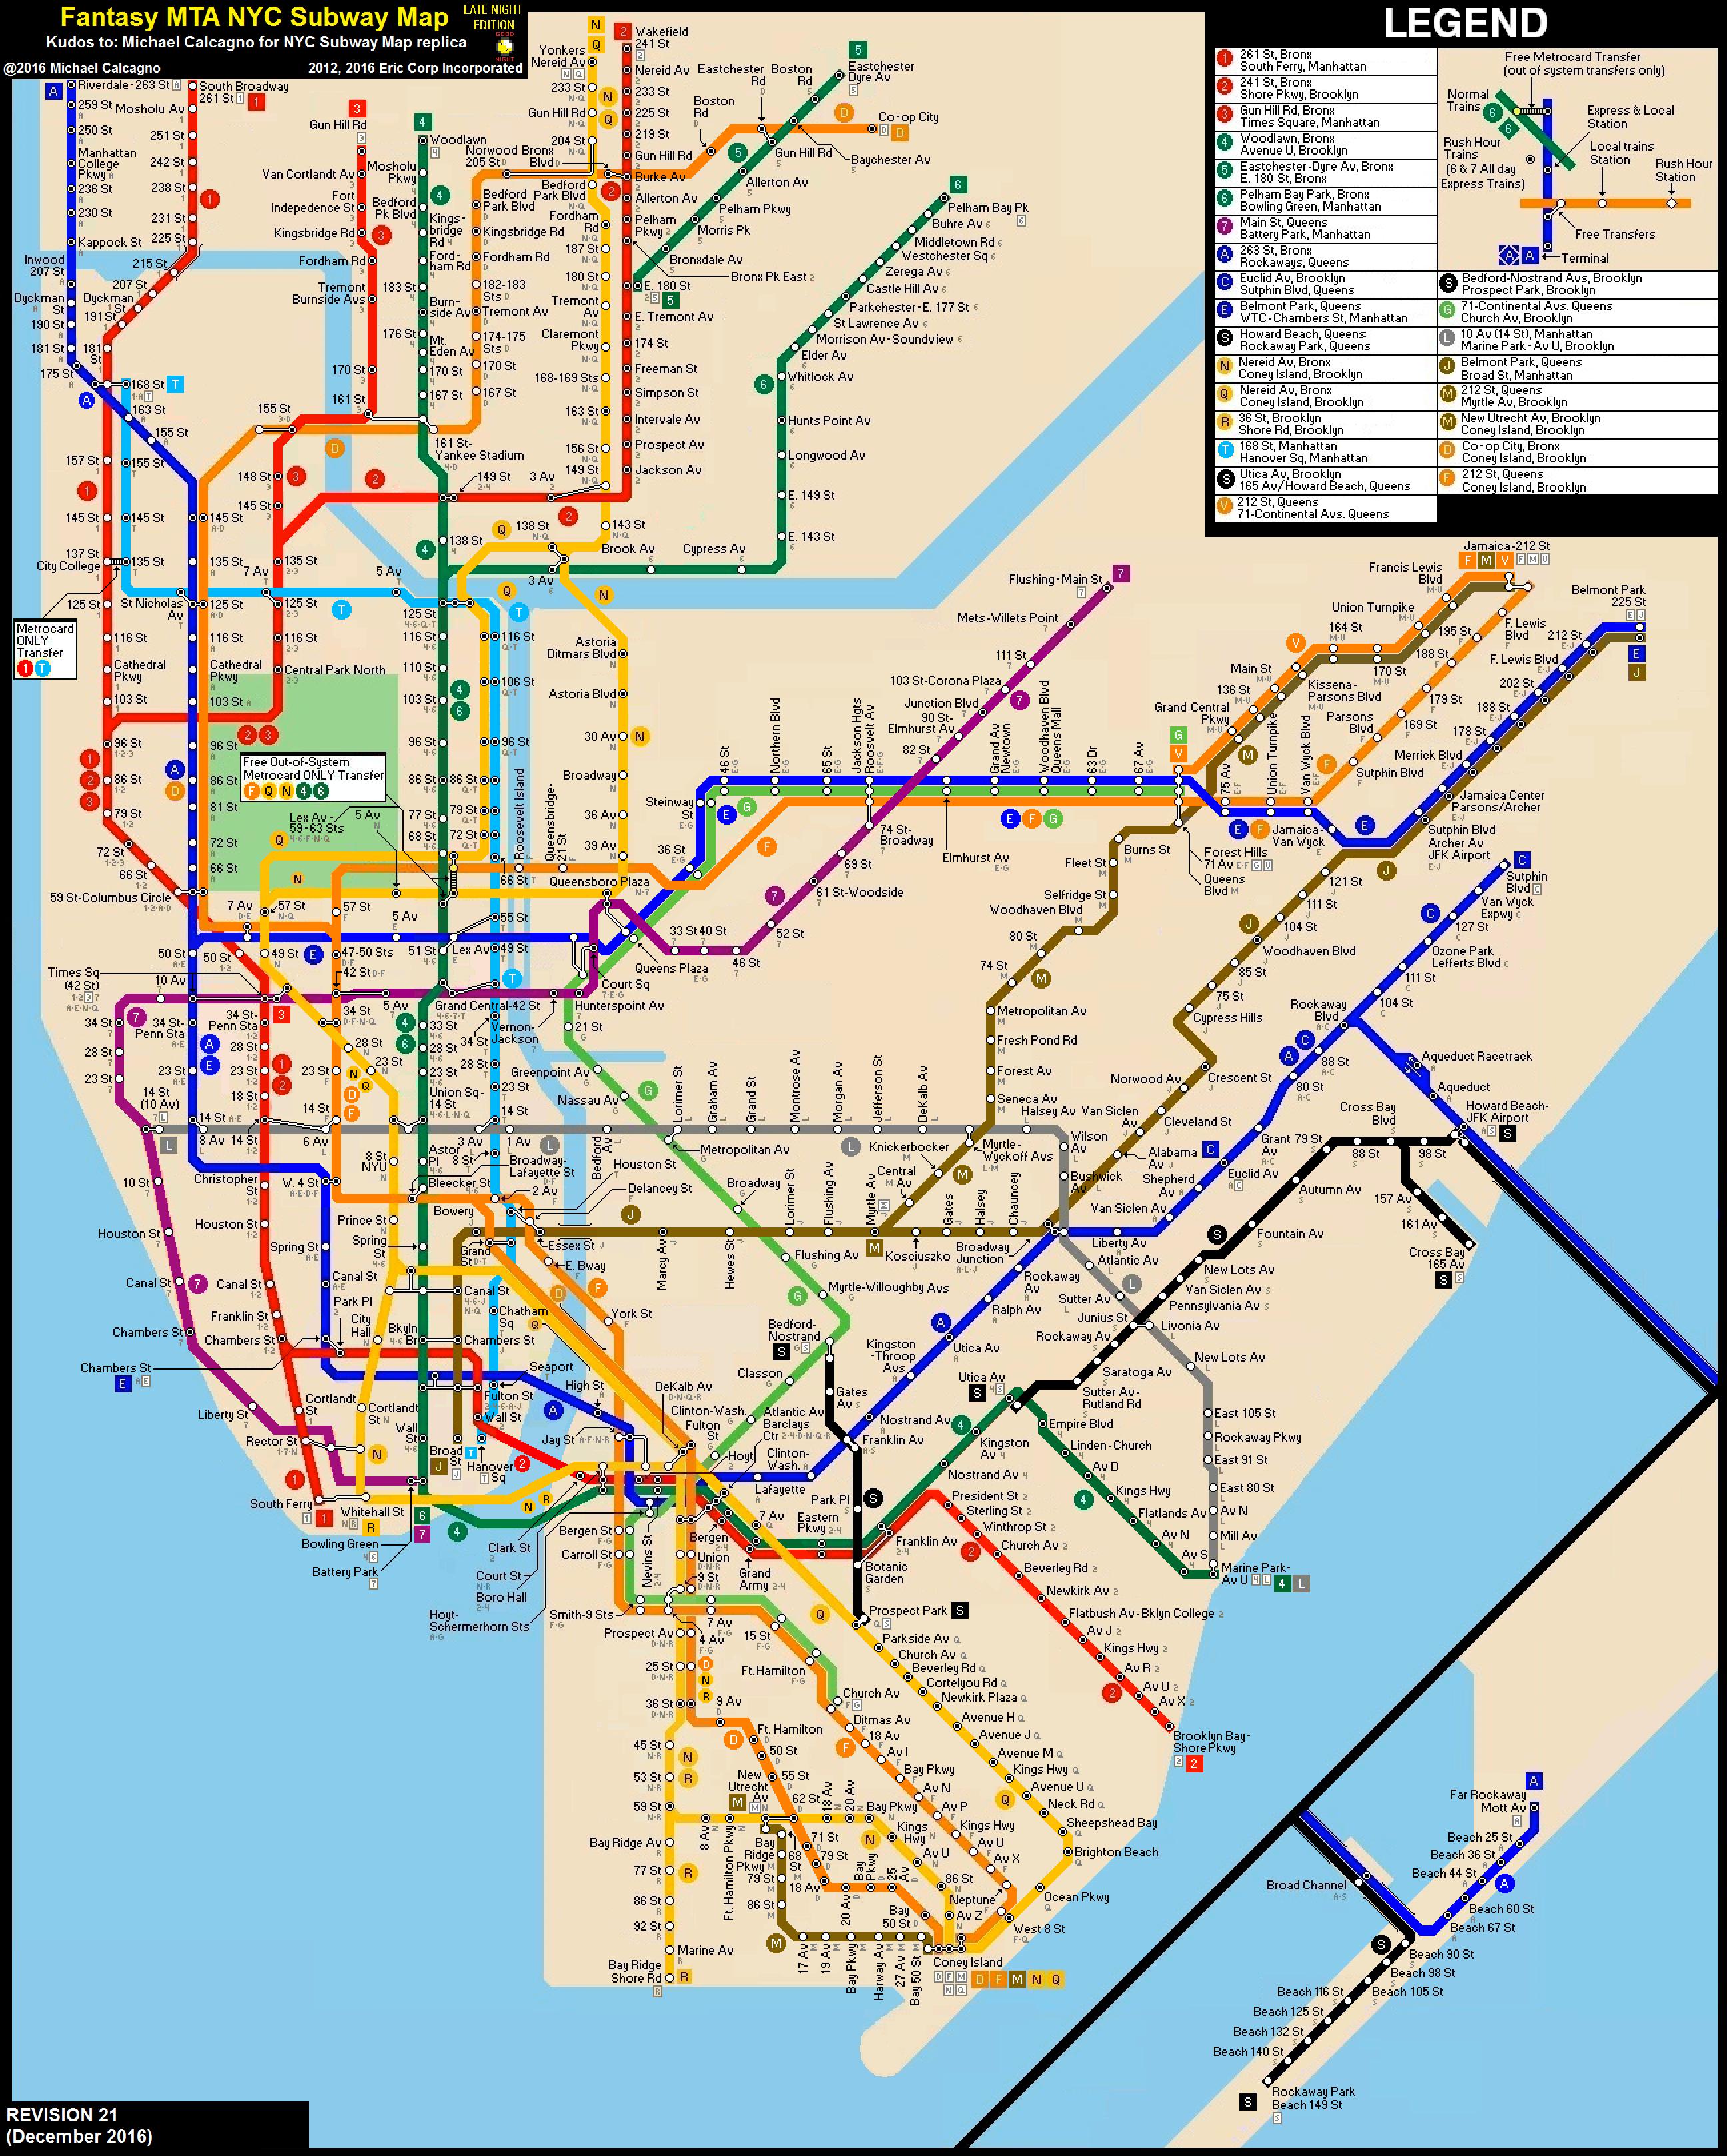 Mta Org Subway Map.Nyc Subway Fantasy Map Revision 21 Late Nights By Ecinc2xxx On